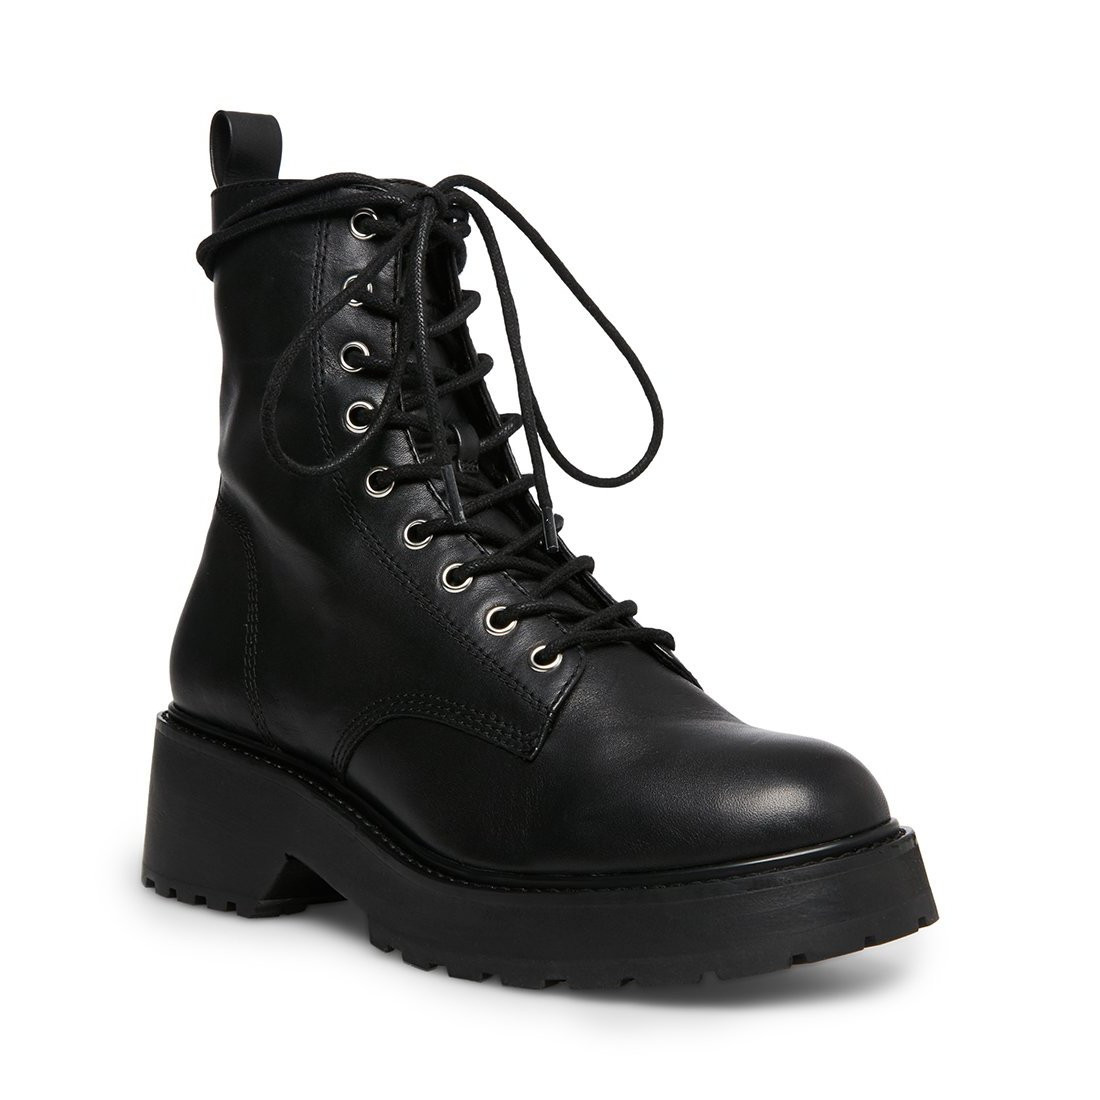 Steve Madden Tornado Black Leather